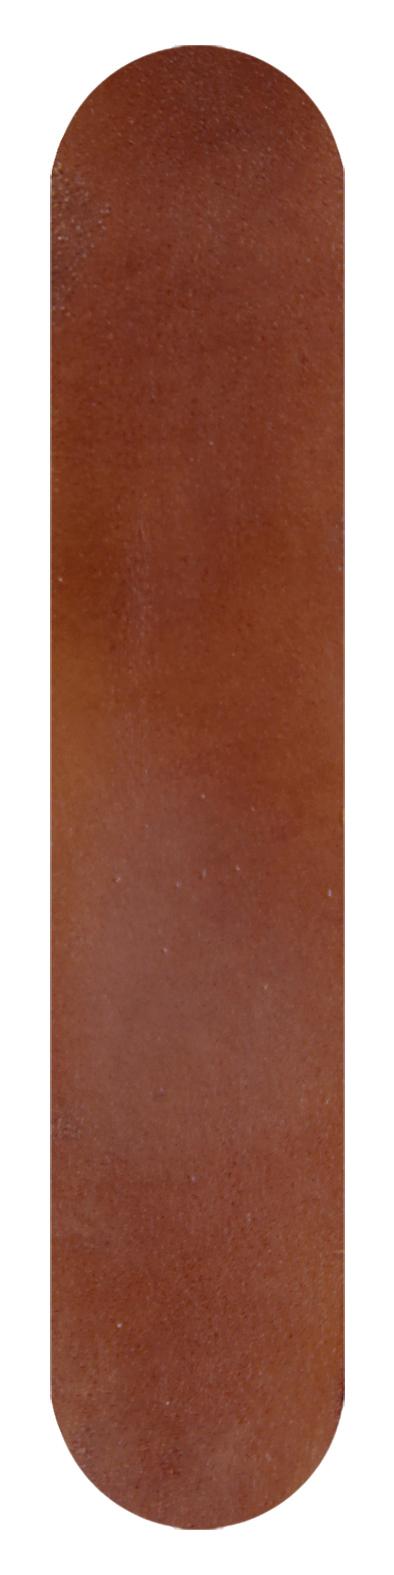 Leather Cuero Cuir Cuoio Leder